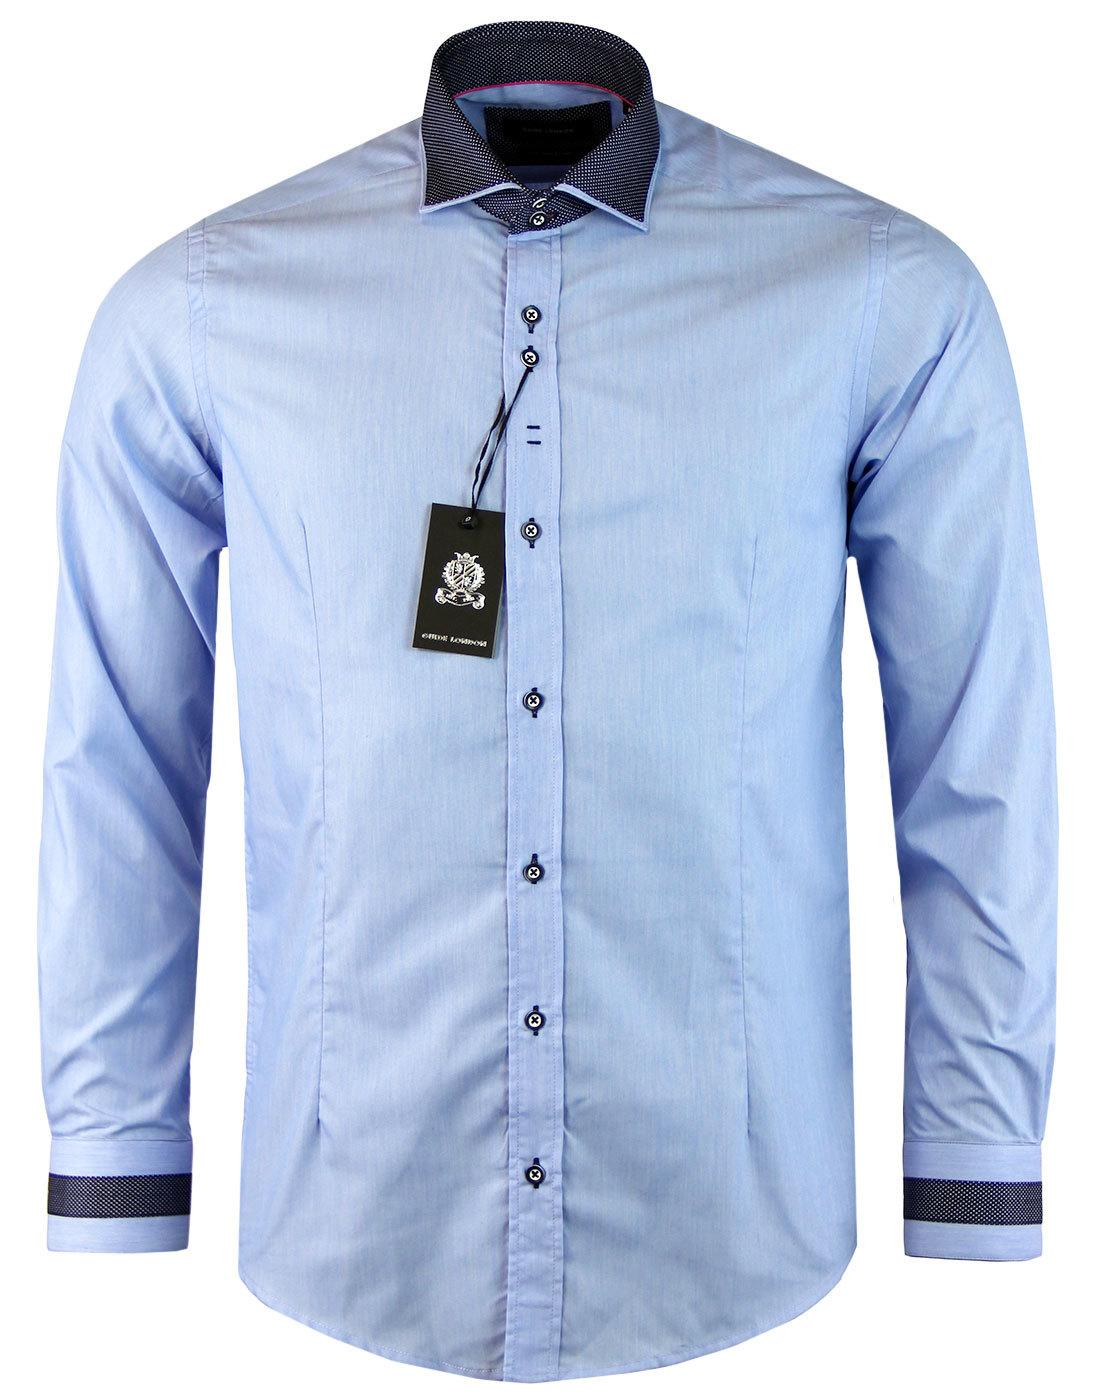 GUIDE LONDON Pindot Collar Retro Mod Smart Shirt